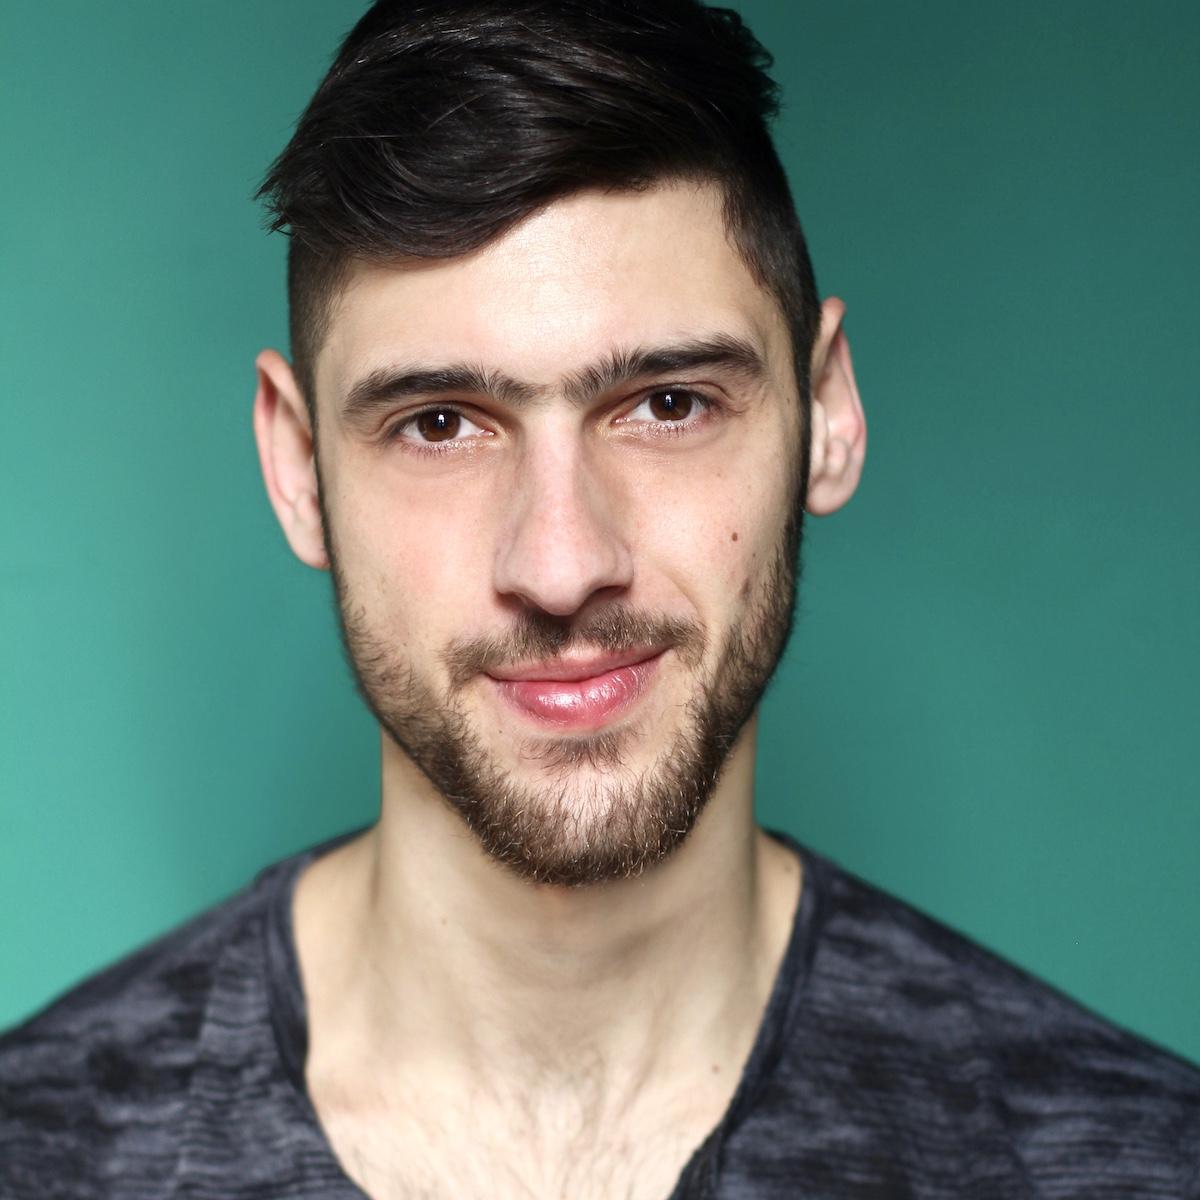 Mikey Greenblatt